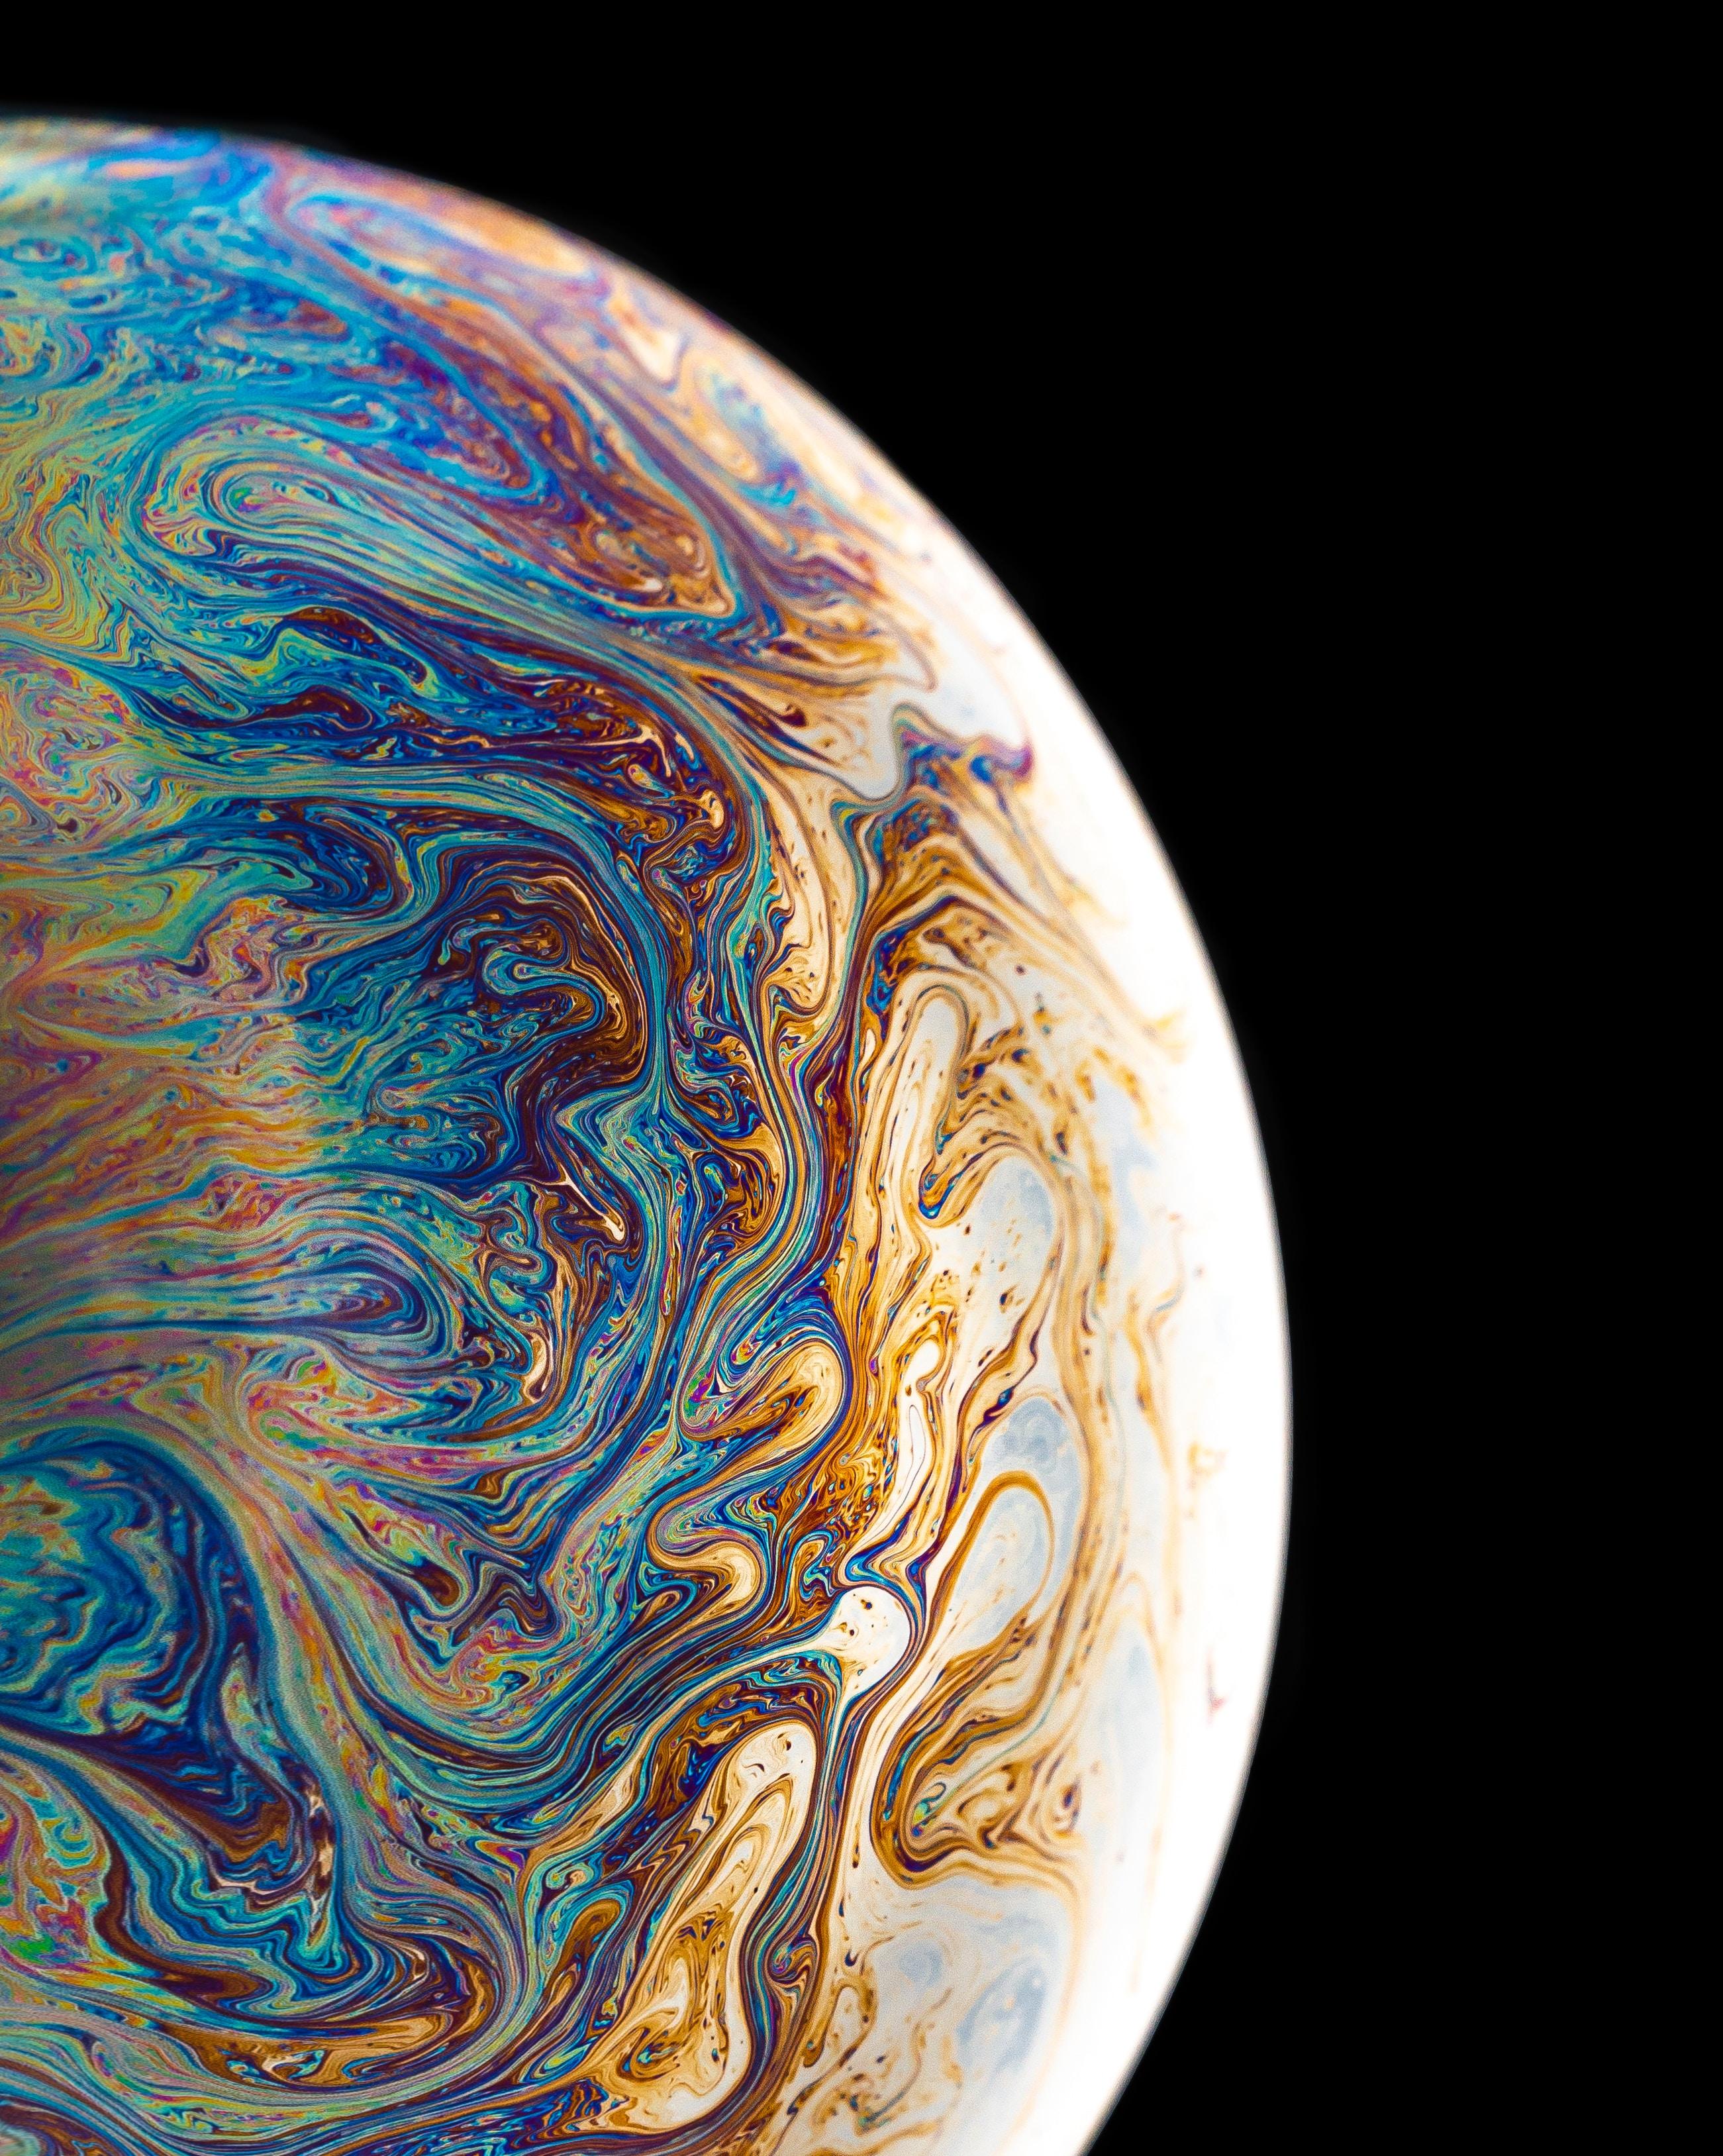 Wallpaper Nature Water Iphone X Iphone Xs Liquid